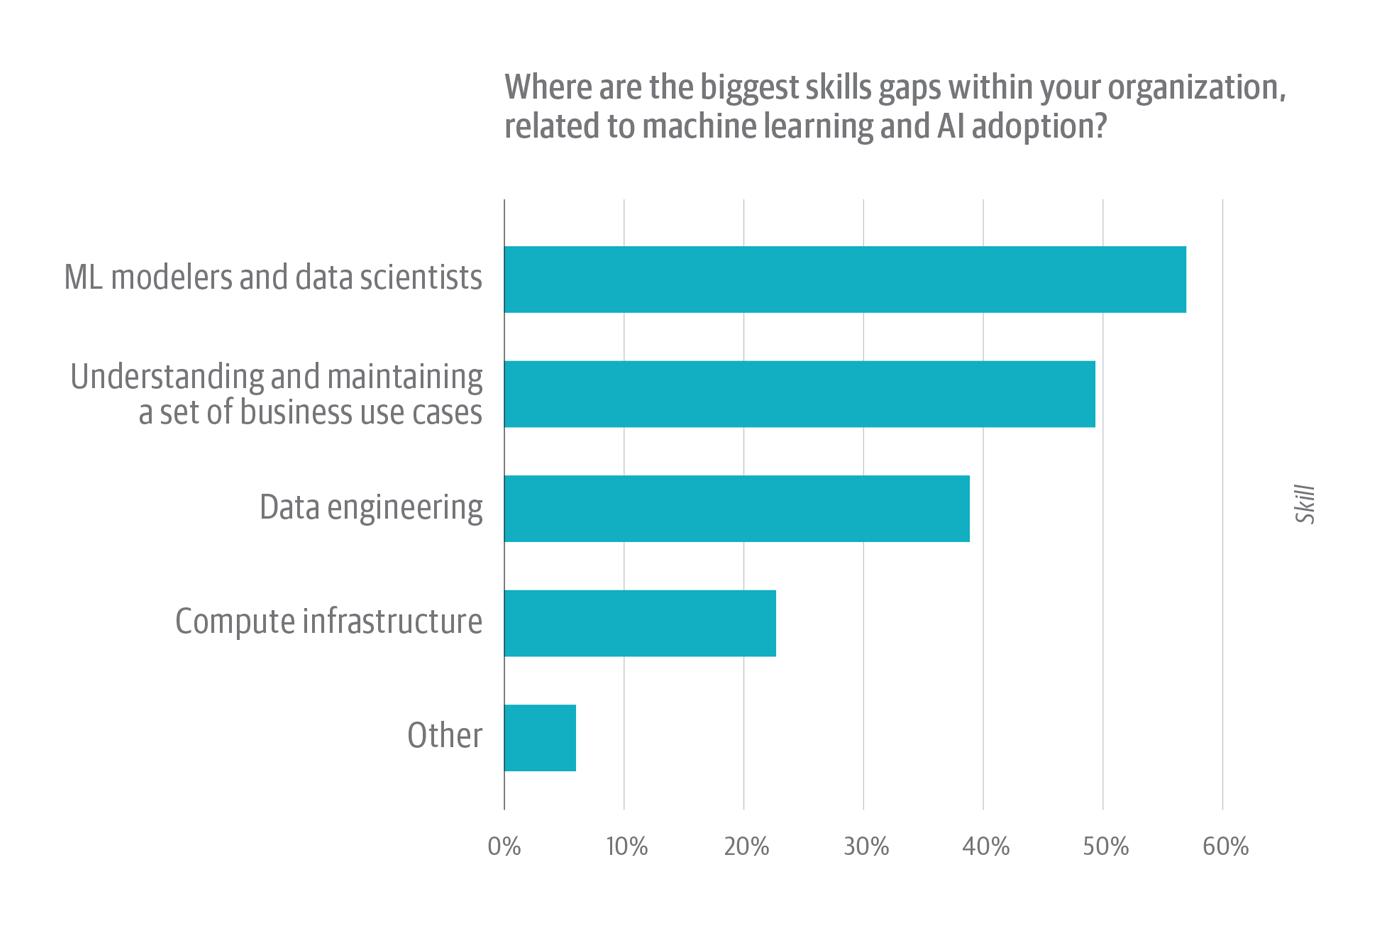 AI/ML skills gaps within organizations